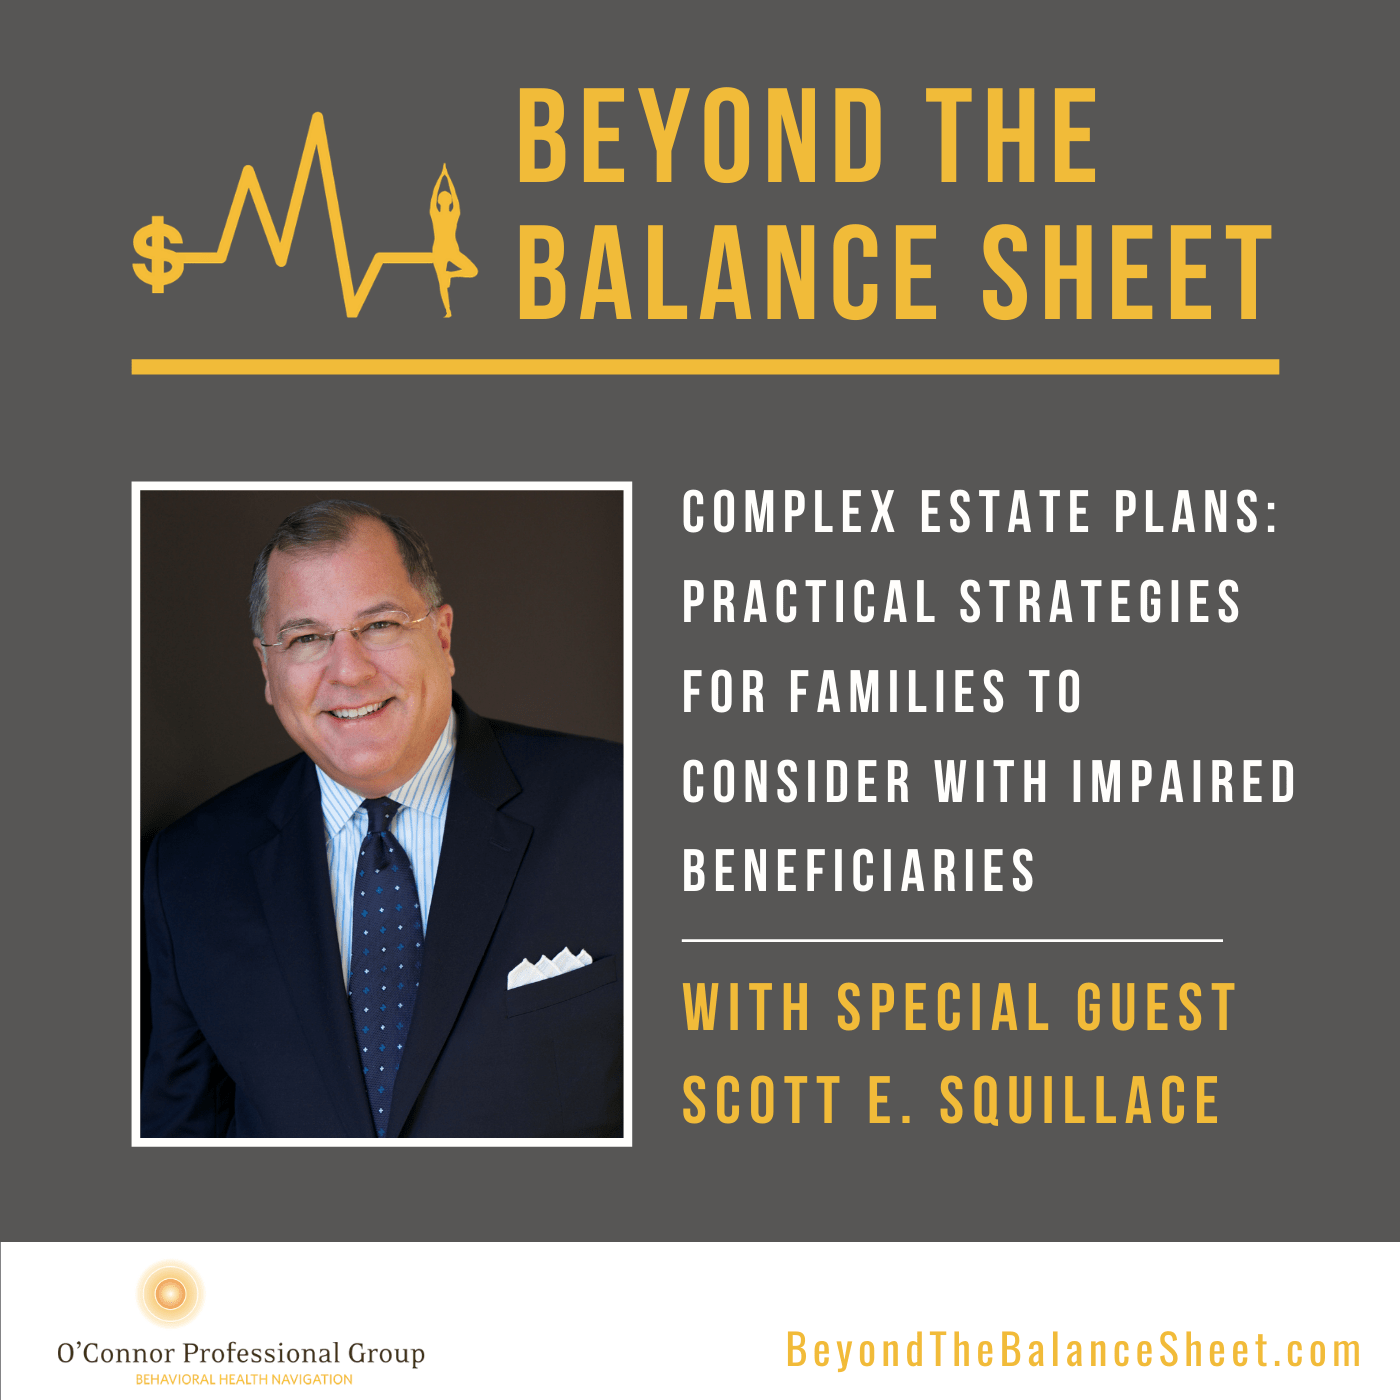 Beyond the Balance Sheet